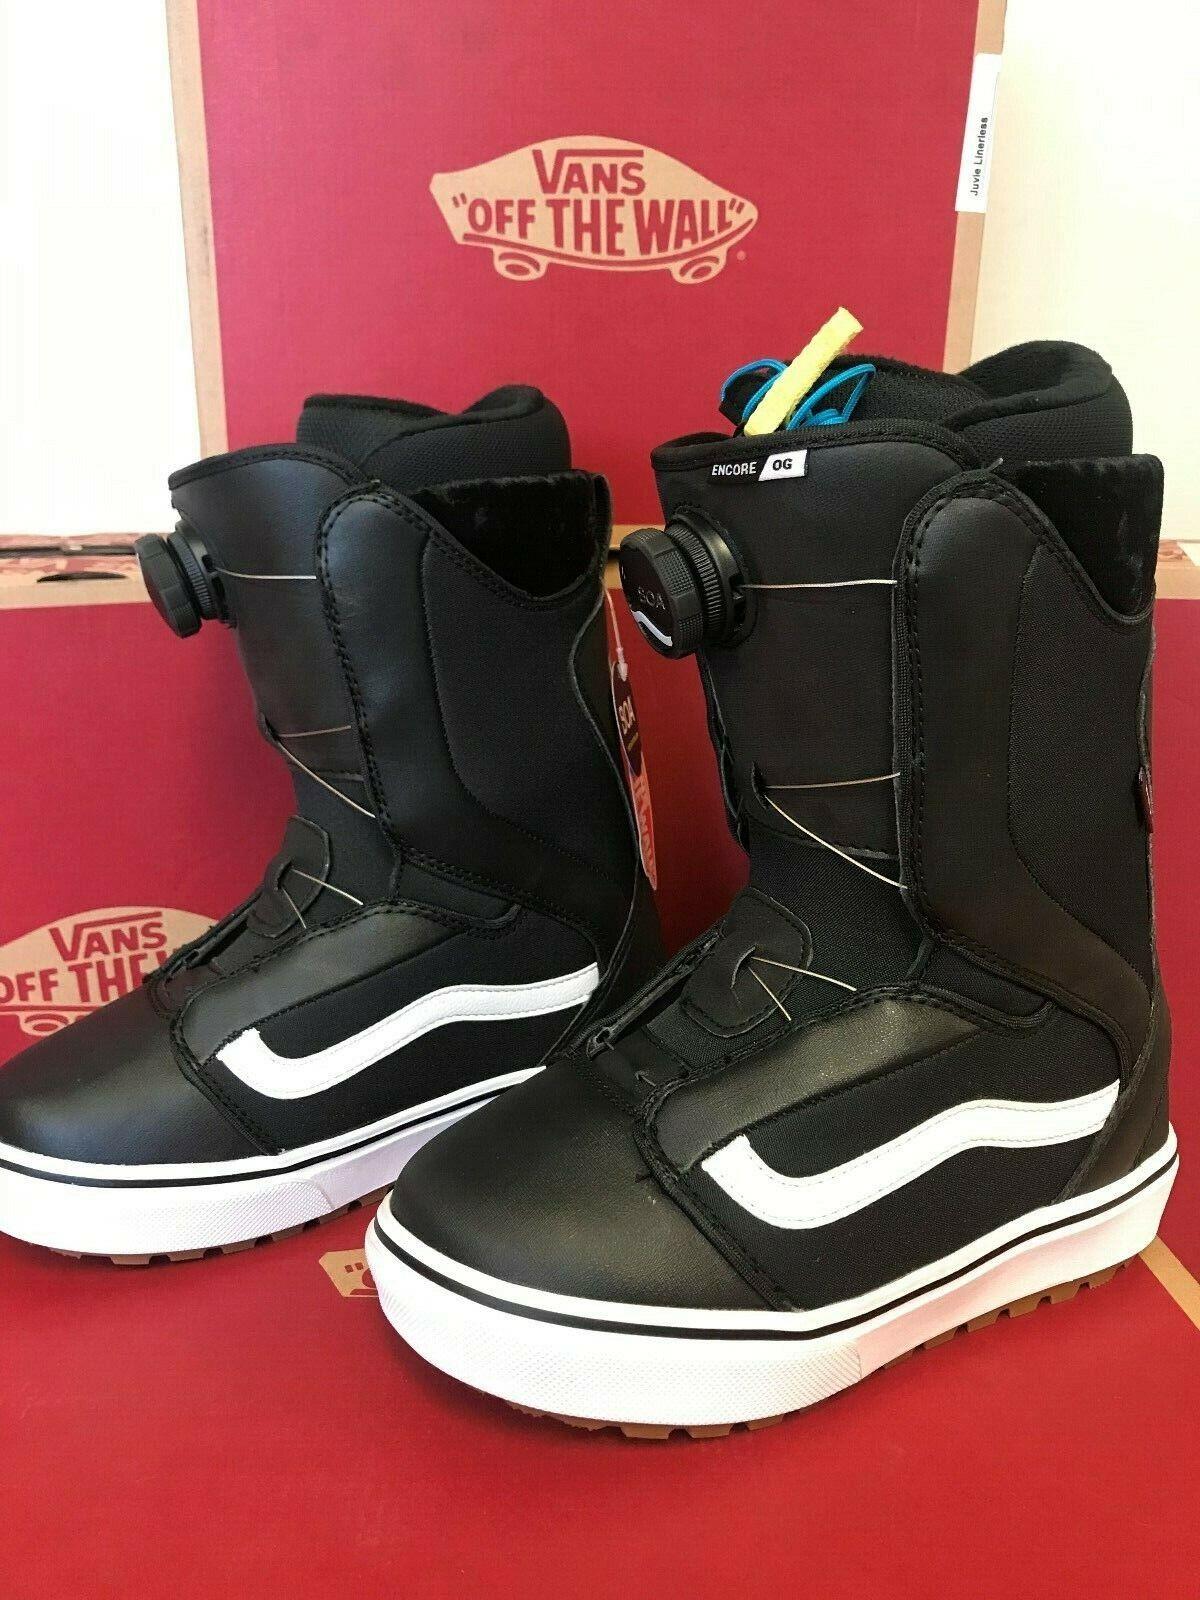 Vans ENCORE OG Women's Snowboarding Boots, Size 8.5, NEW